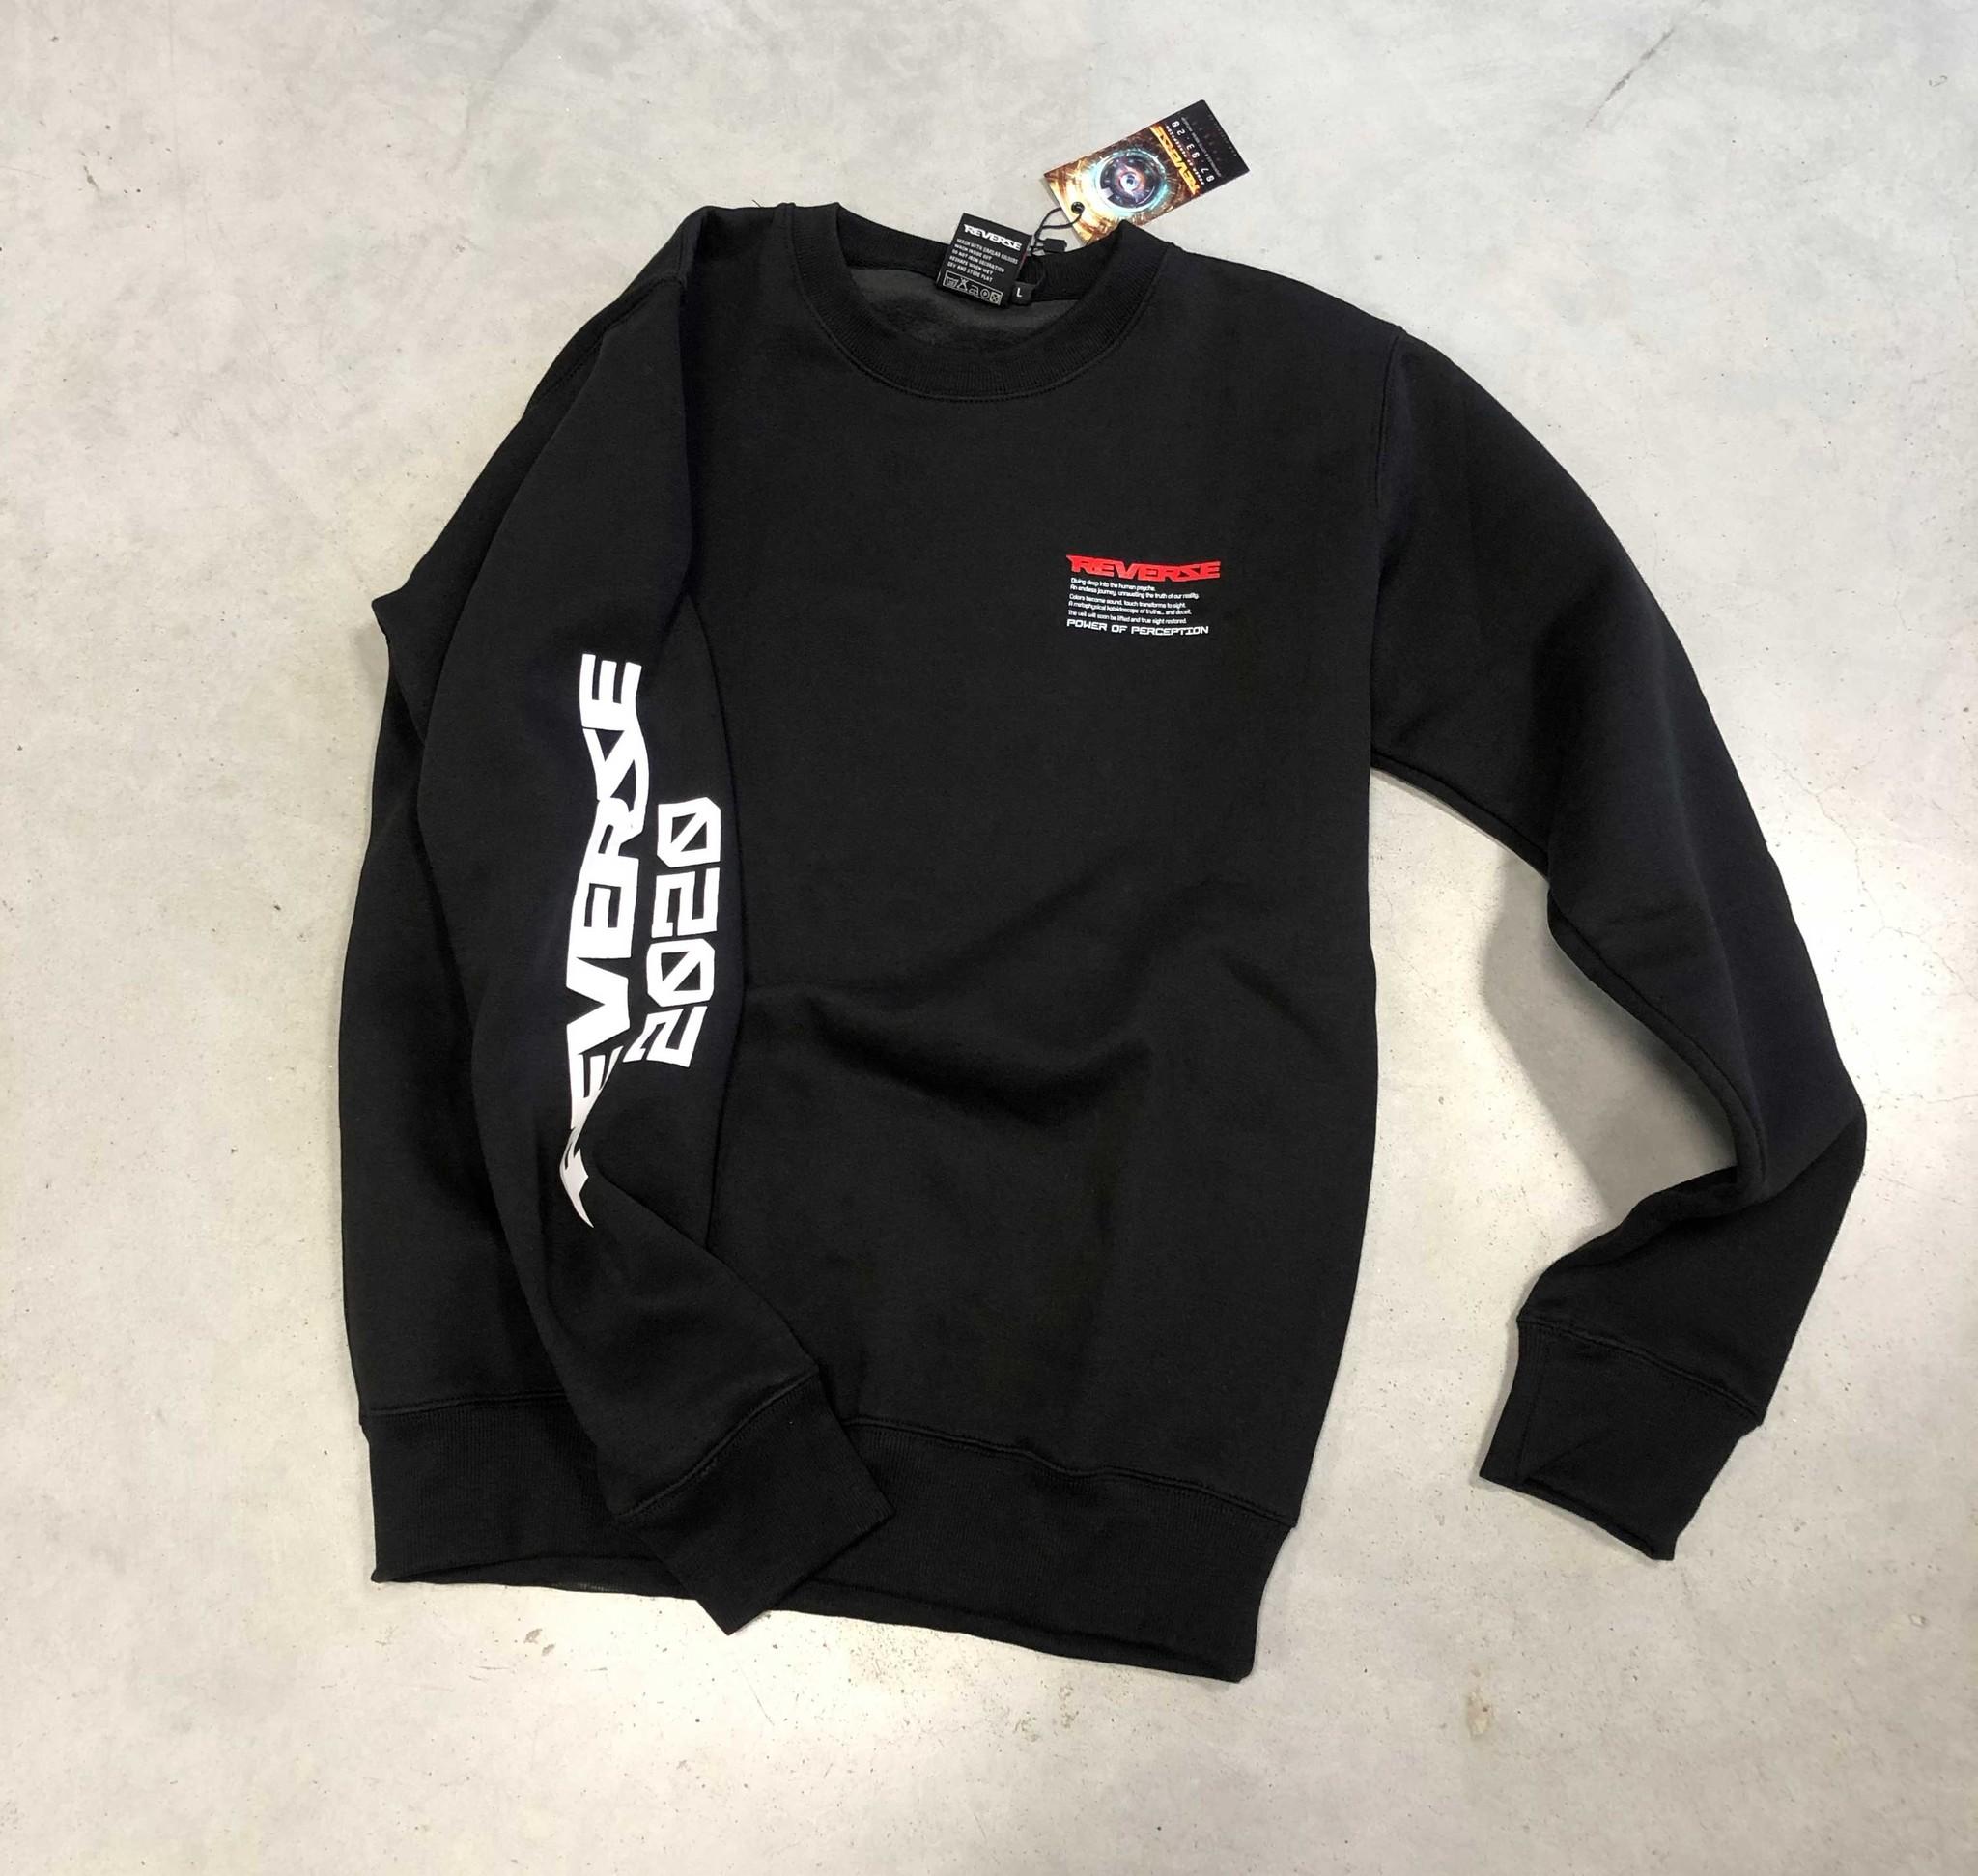 Power Of Perception - Crewneck Sweater